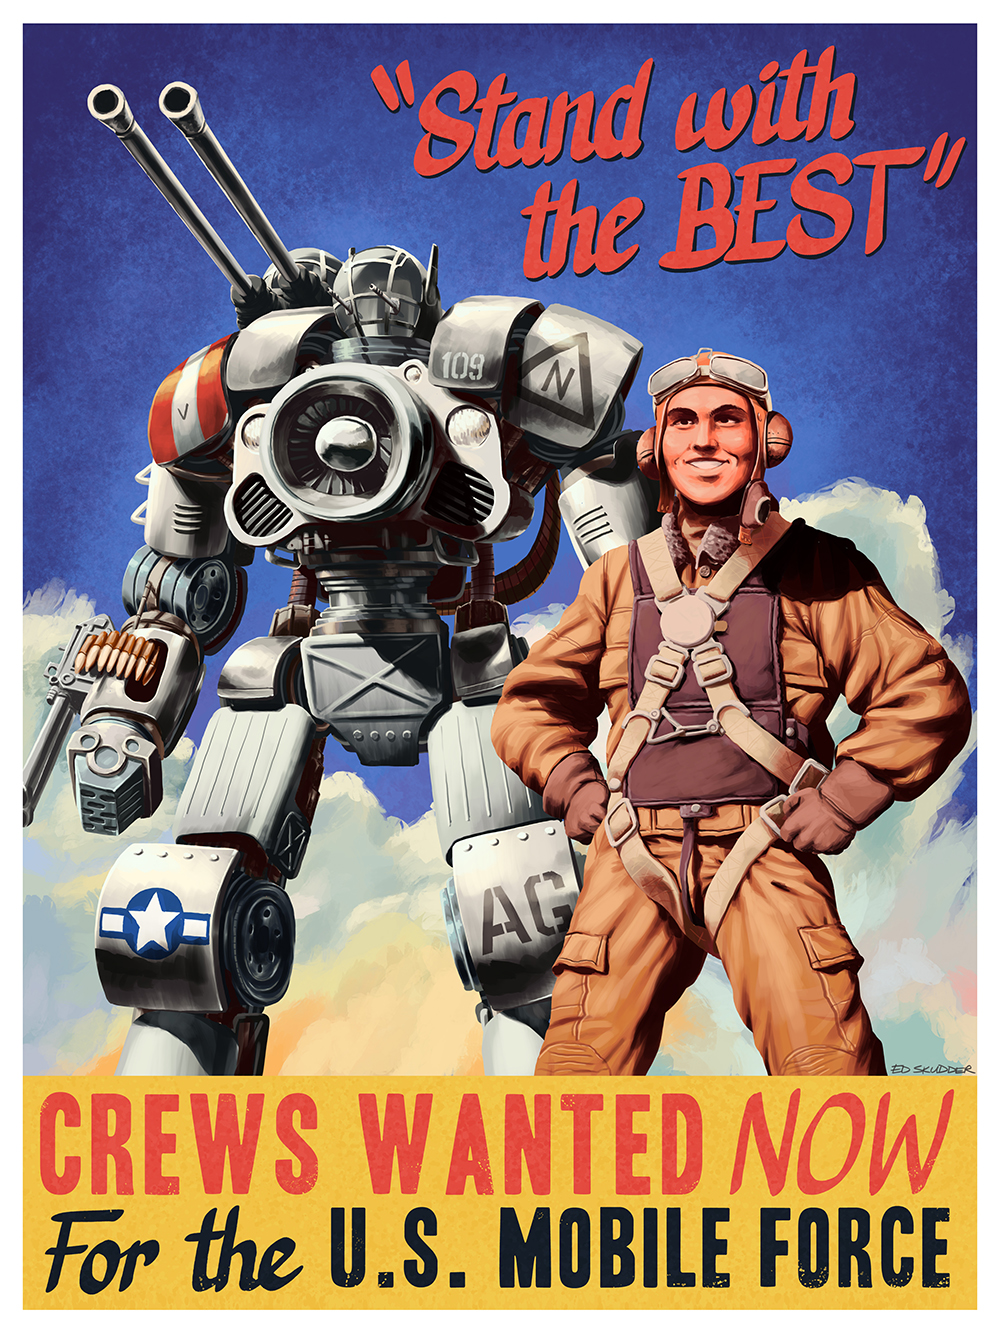 """Mobile Force Propaganda Poster"" by Ed Skudder"